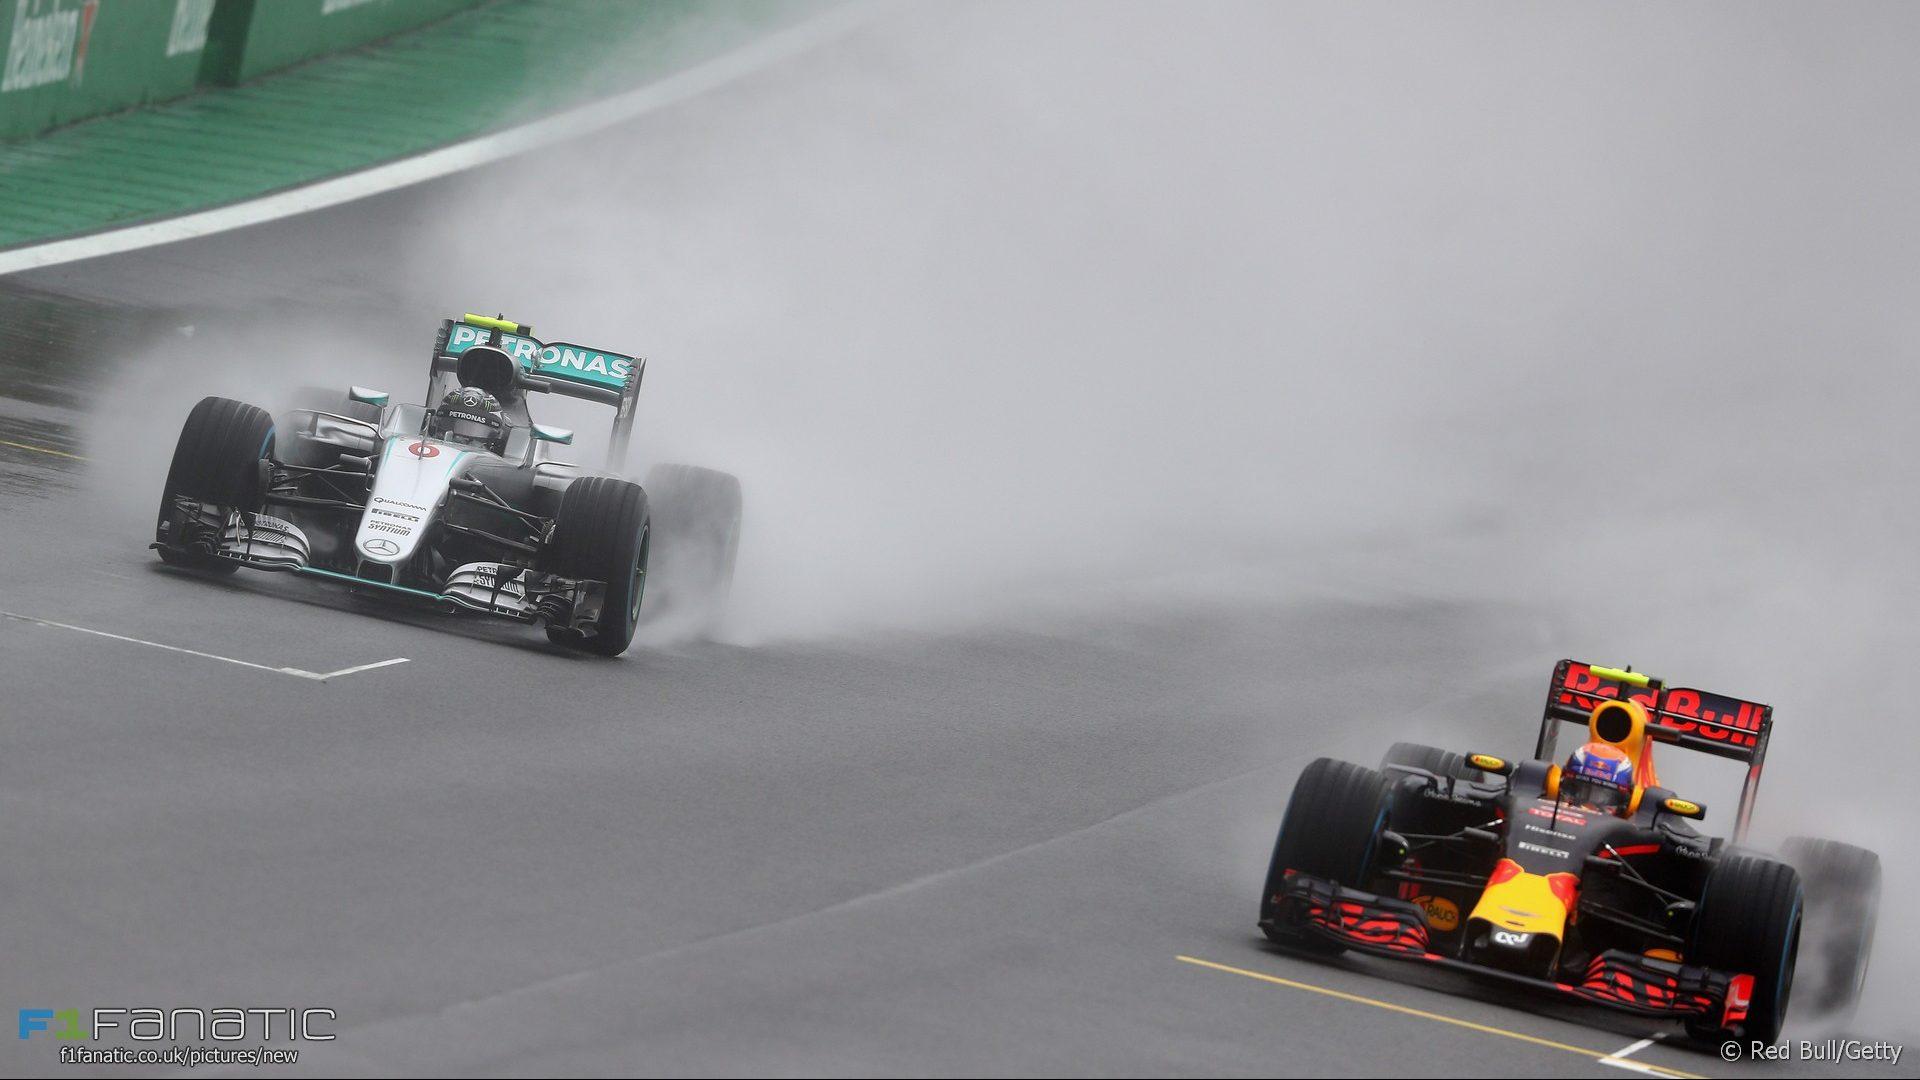 Nico Rosberg, Max Verstappen, Interlagos, 2016